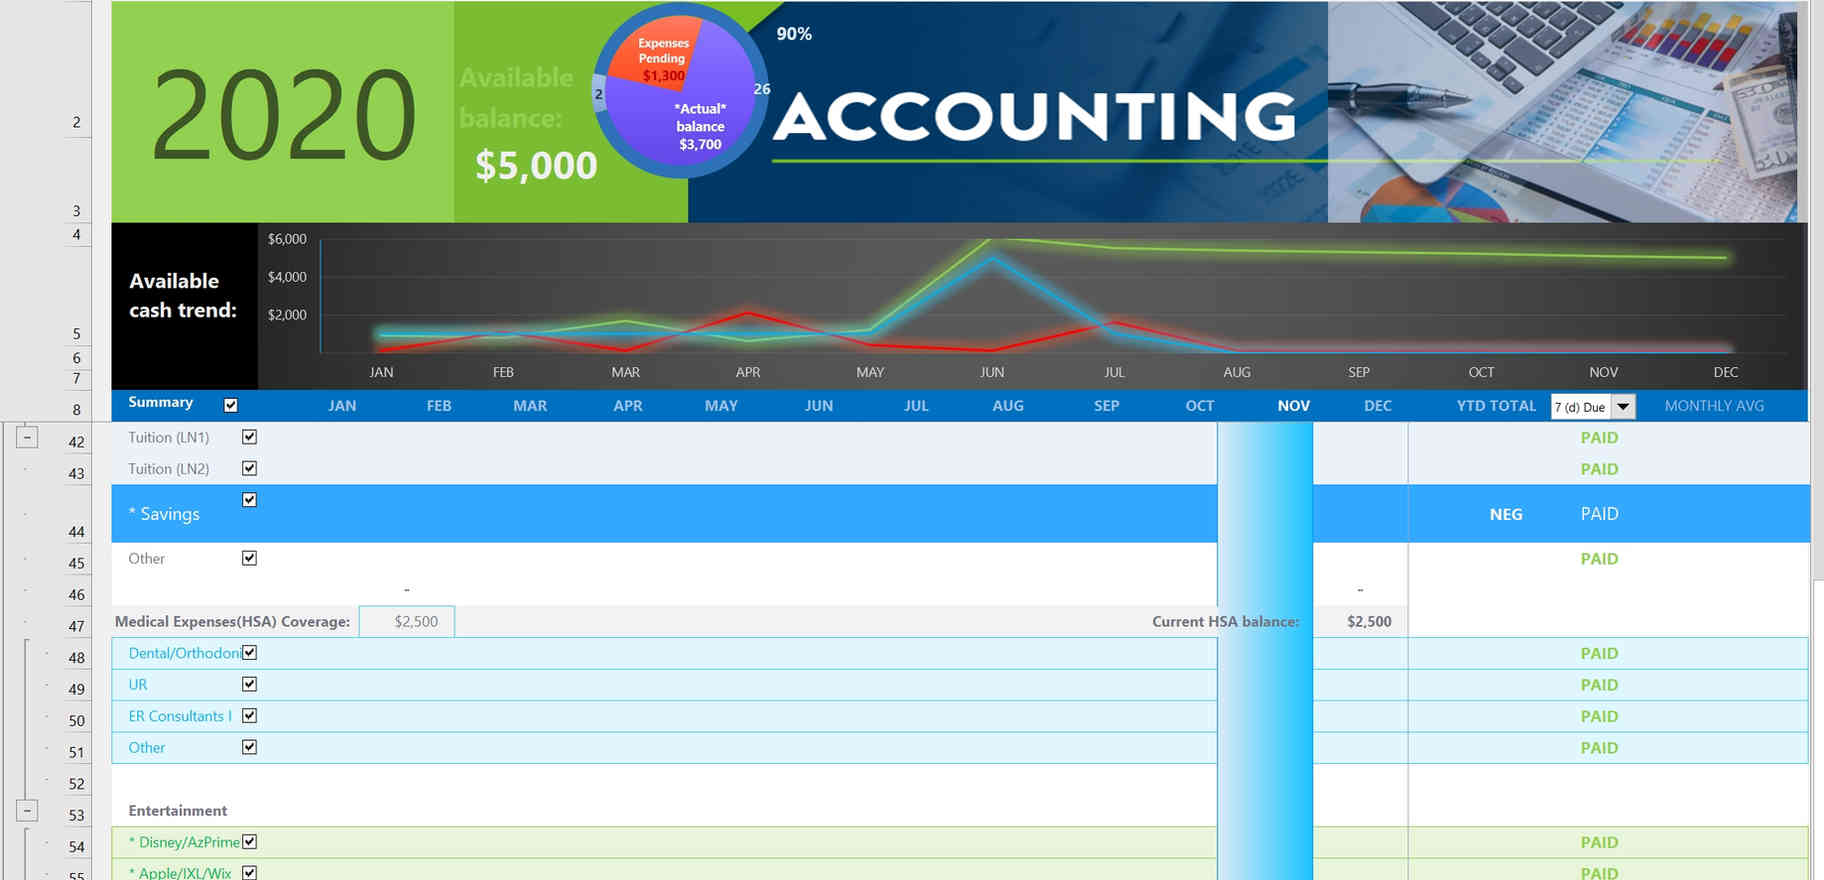 Budget_template.xlsm - Excel_11_27_2020